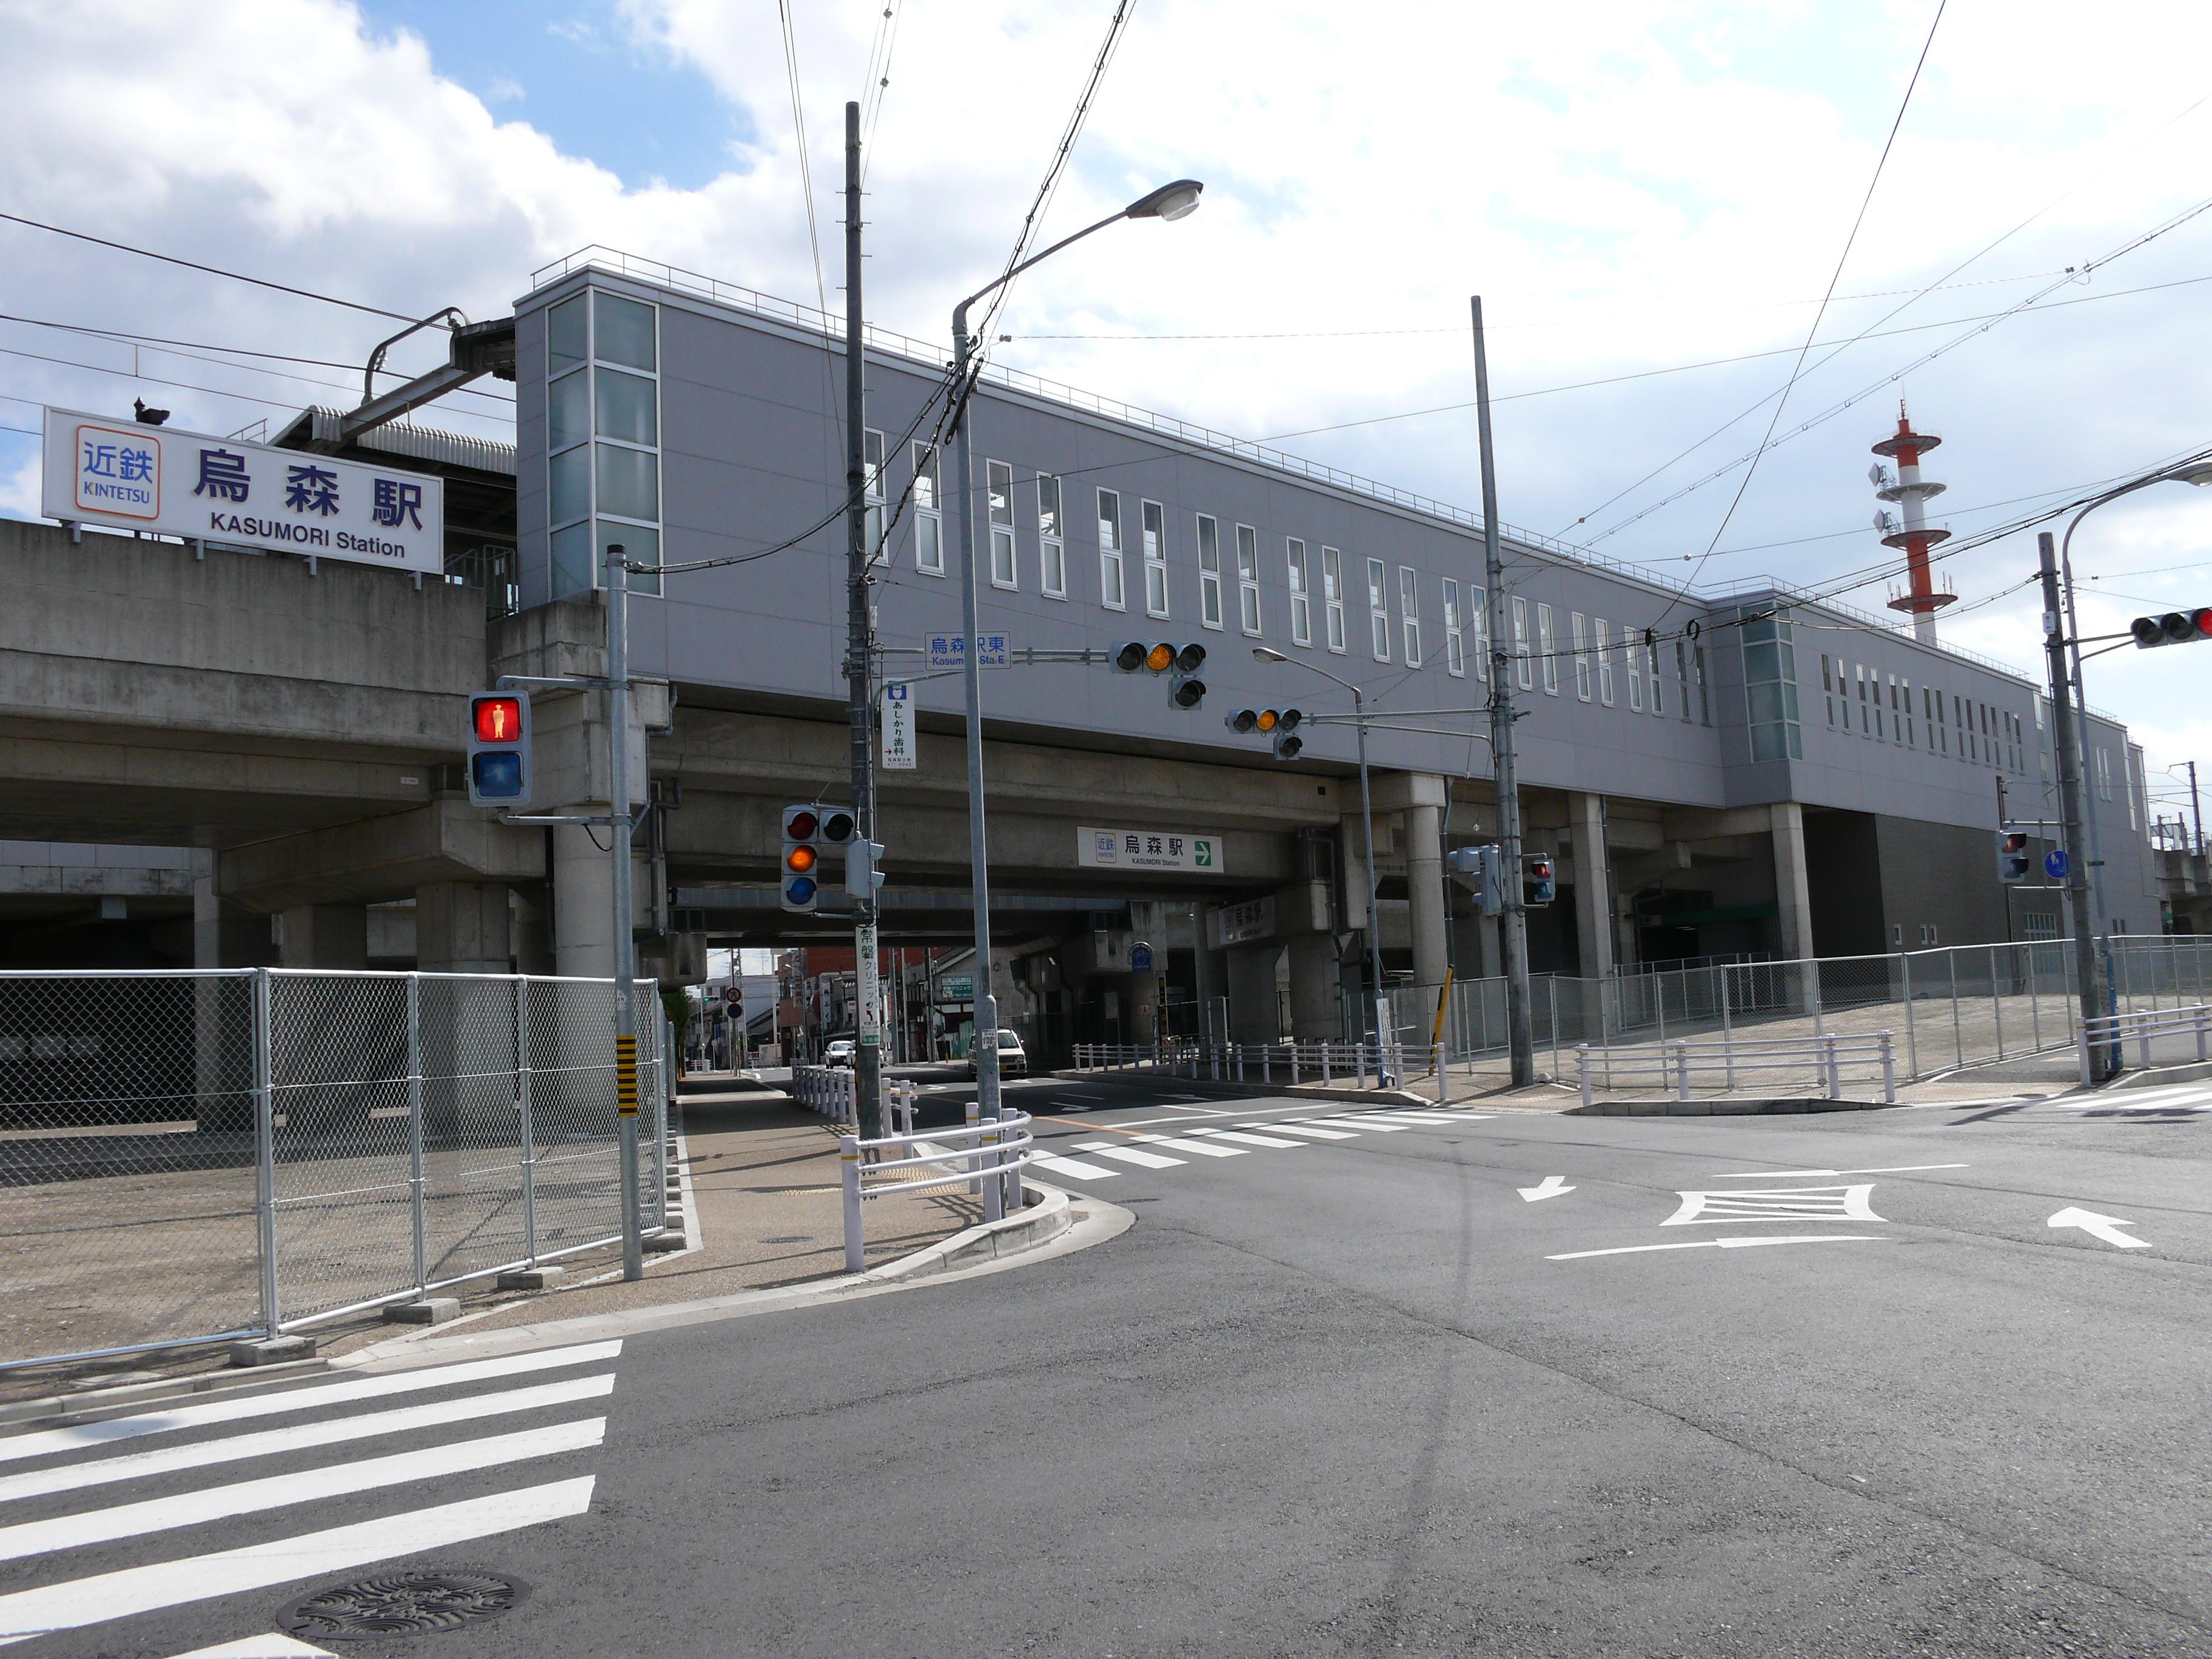 https://upload.wikimedia.org/wikipedia/commons/9/93/Kintetsu_Kasumori_Station_01.JPG